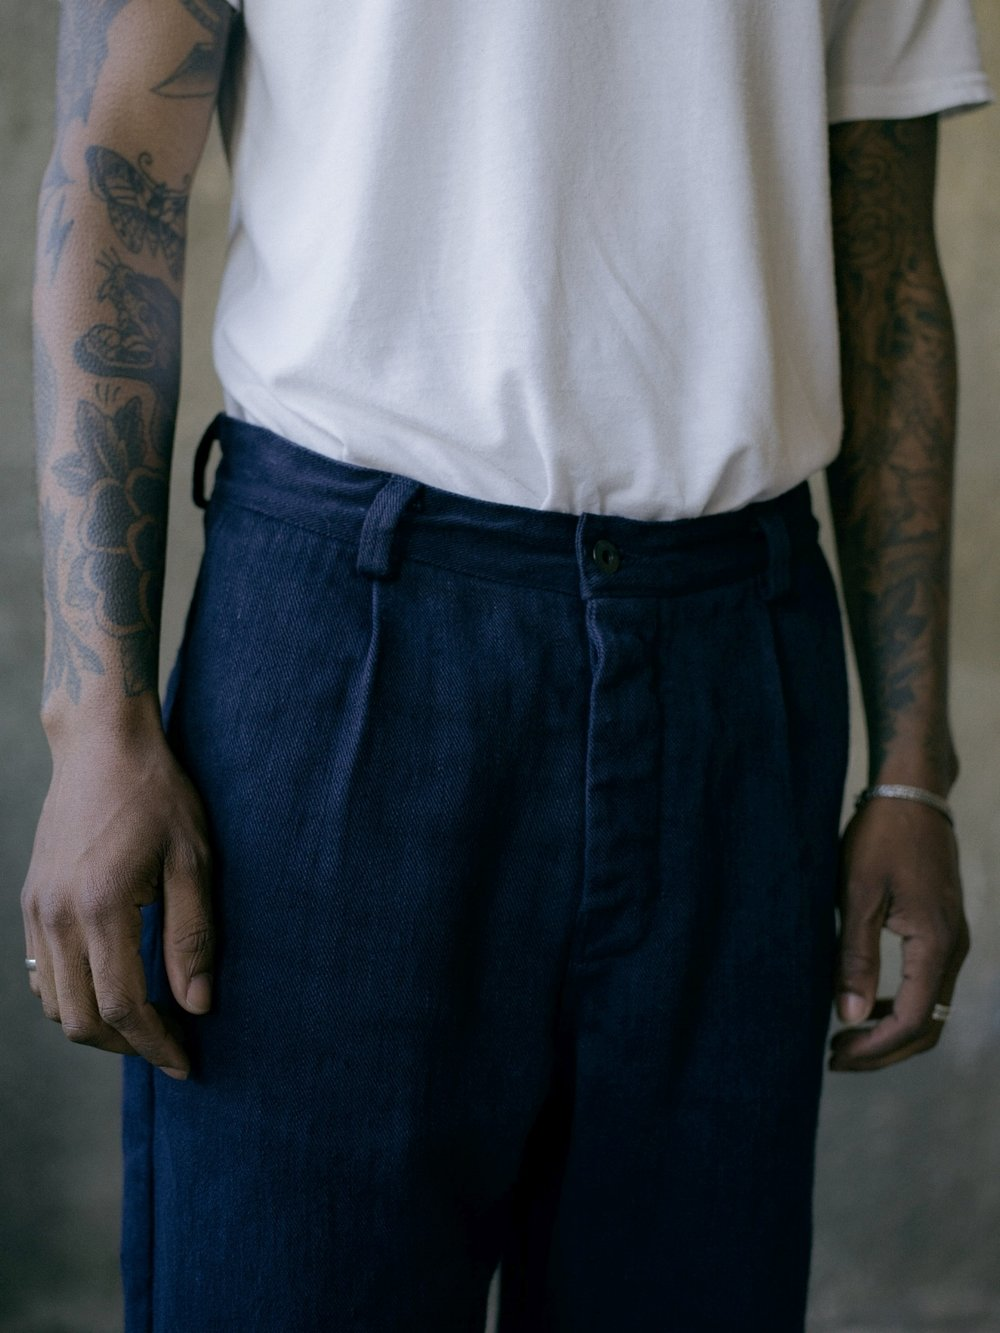 evan-kinori-single-pleat-pant-french-blue-hemp-twill-2